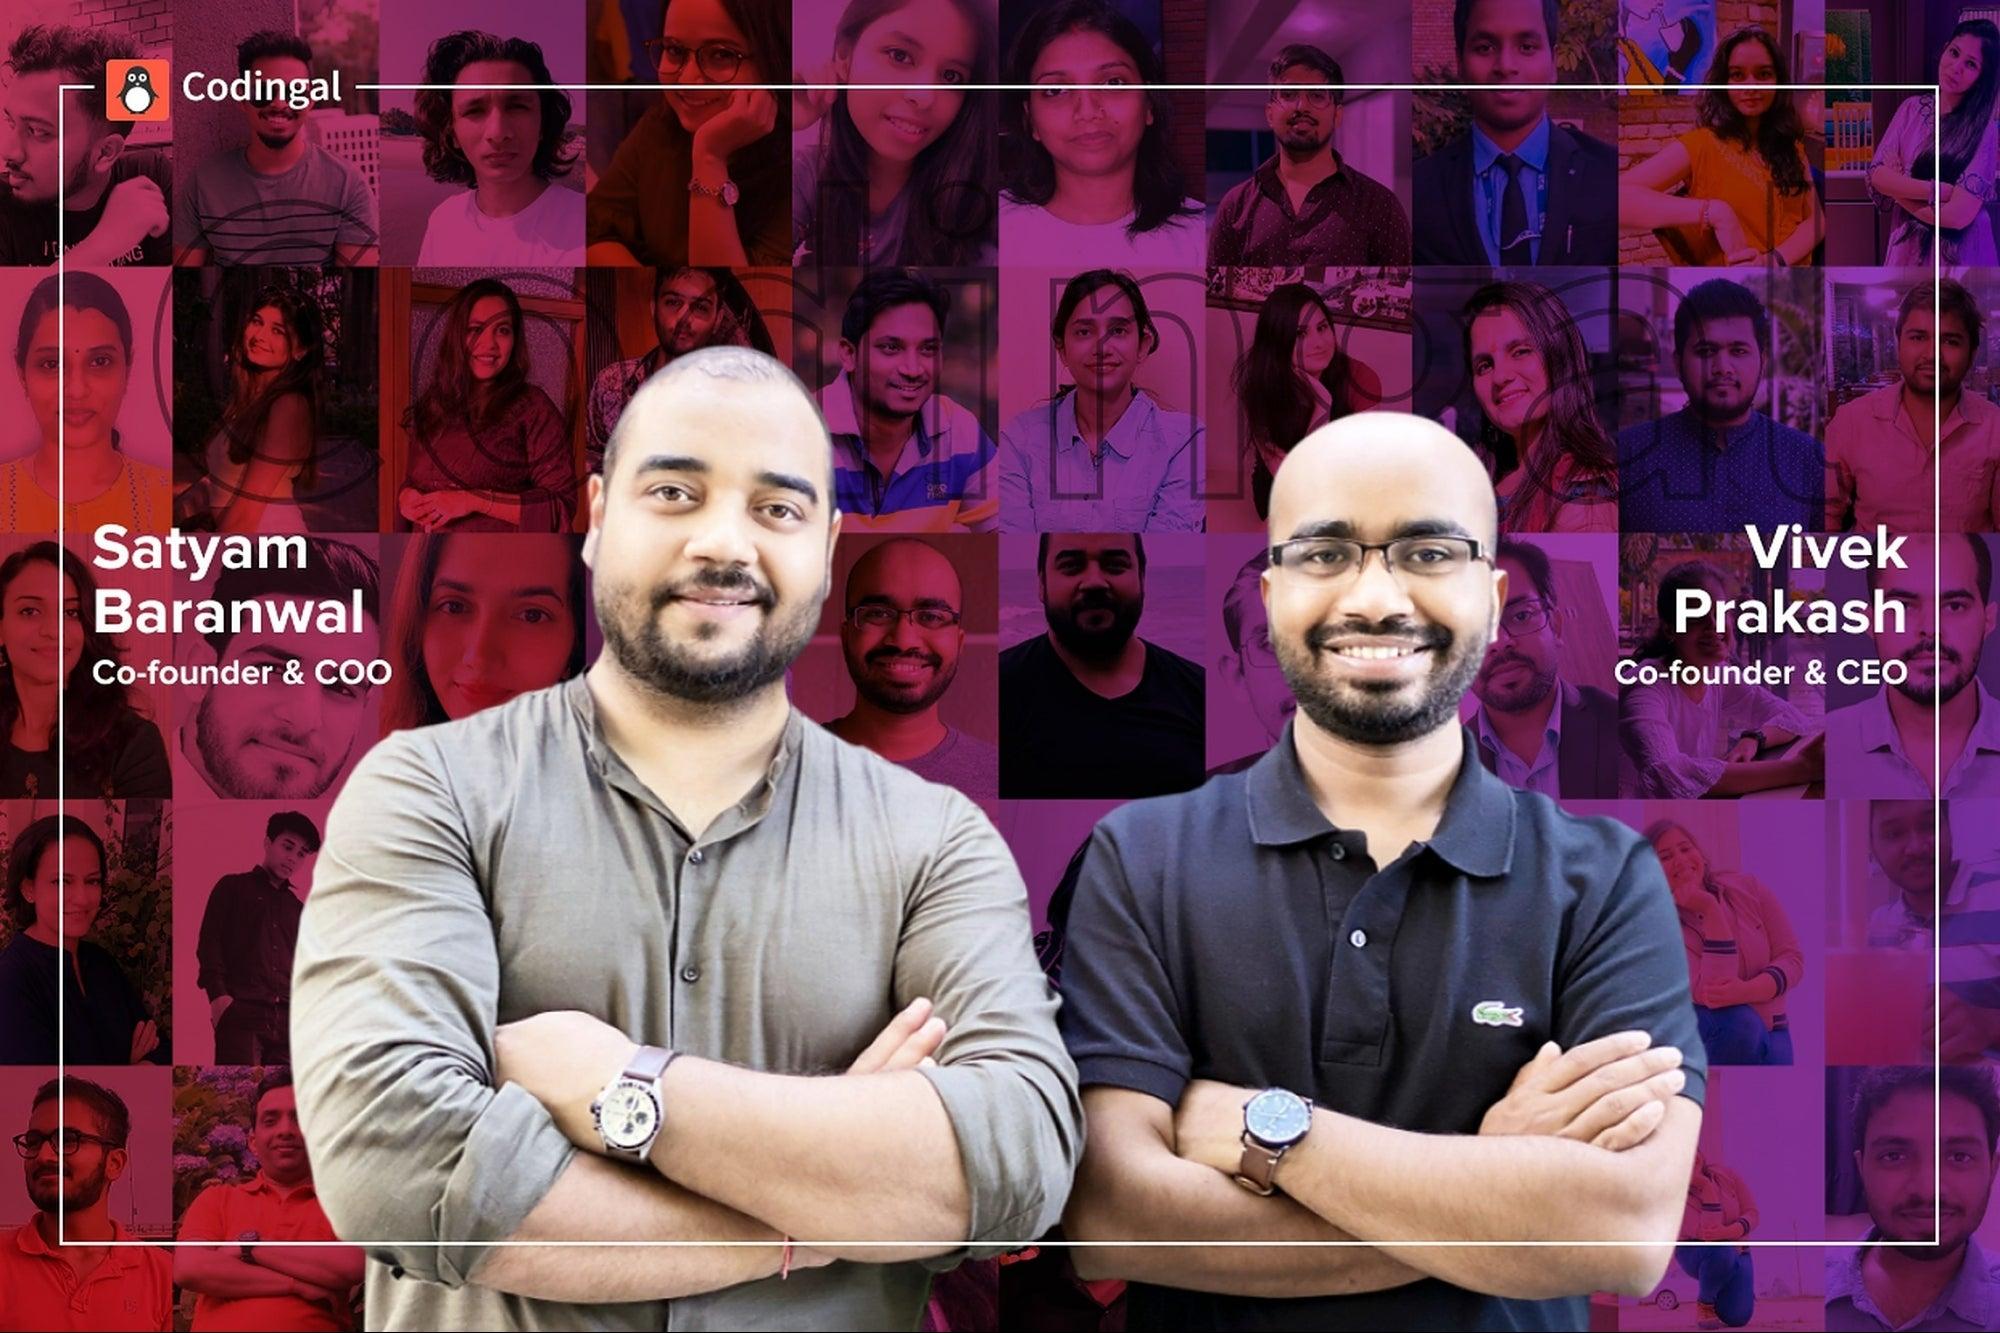 YC-backed Edtech Platform Codingal Raises $1.2 Mn In Seed Round